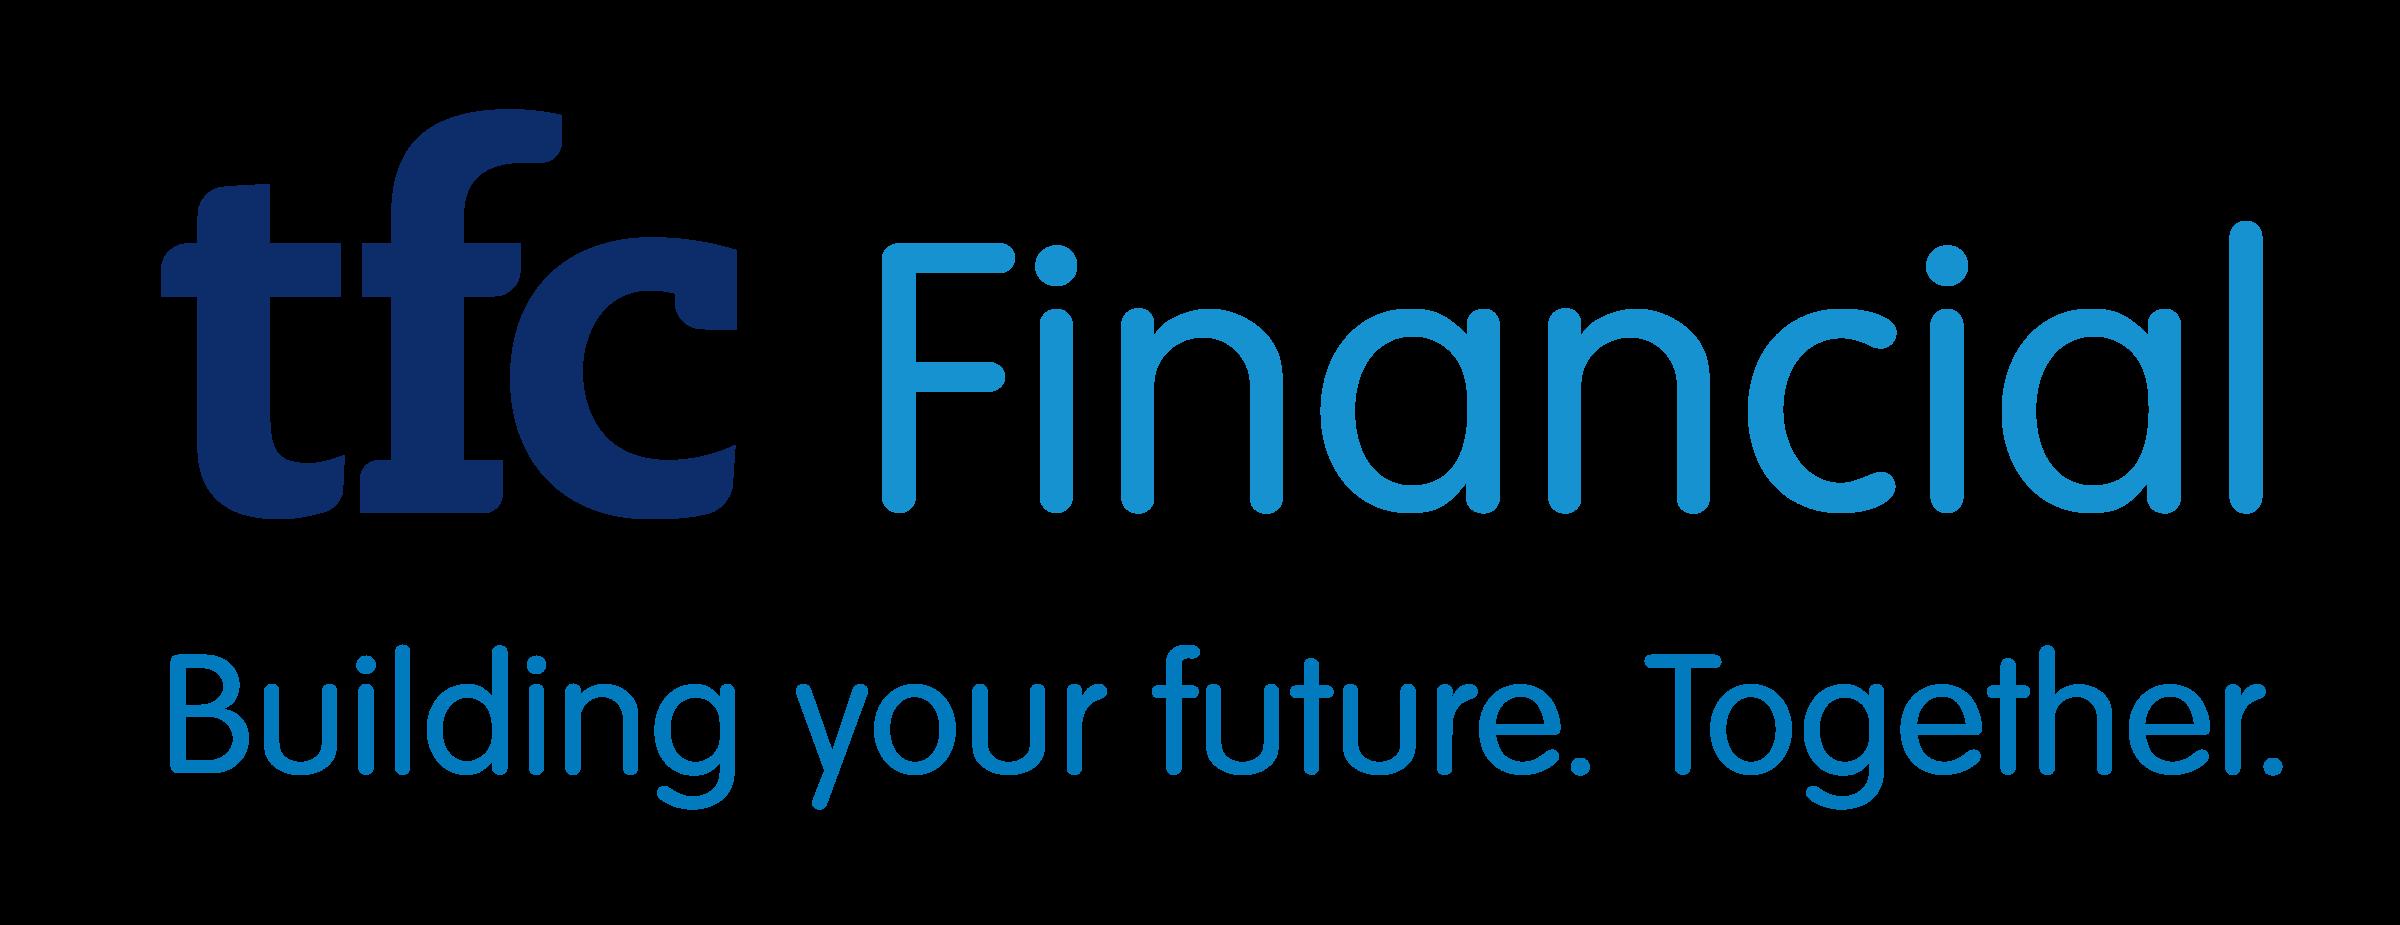 TFC Financial